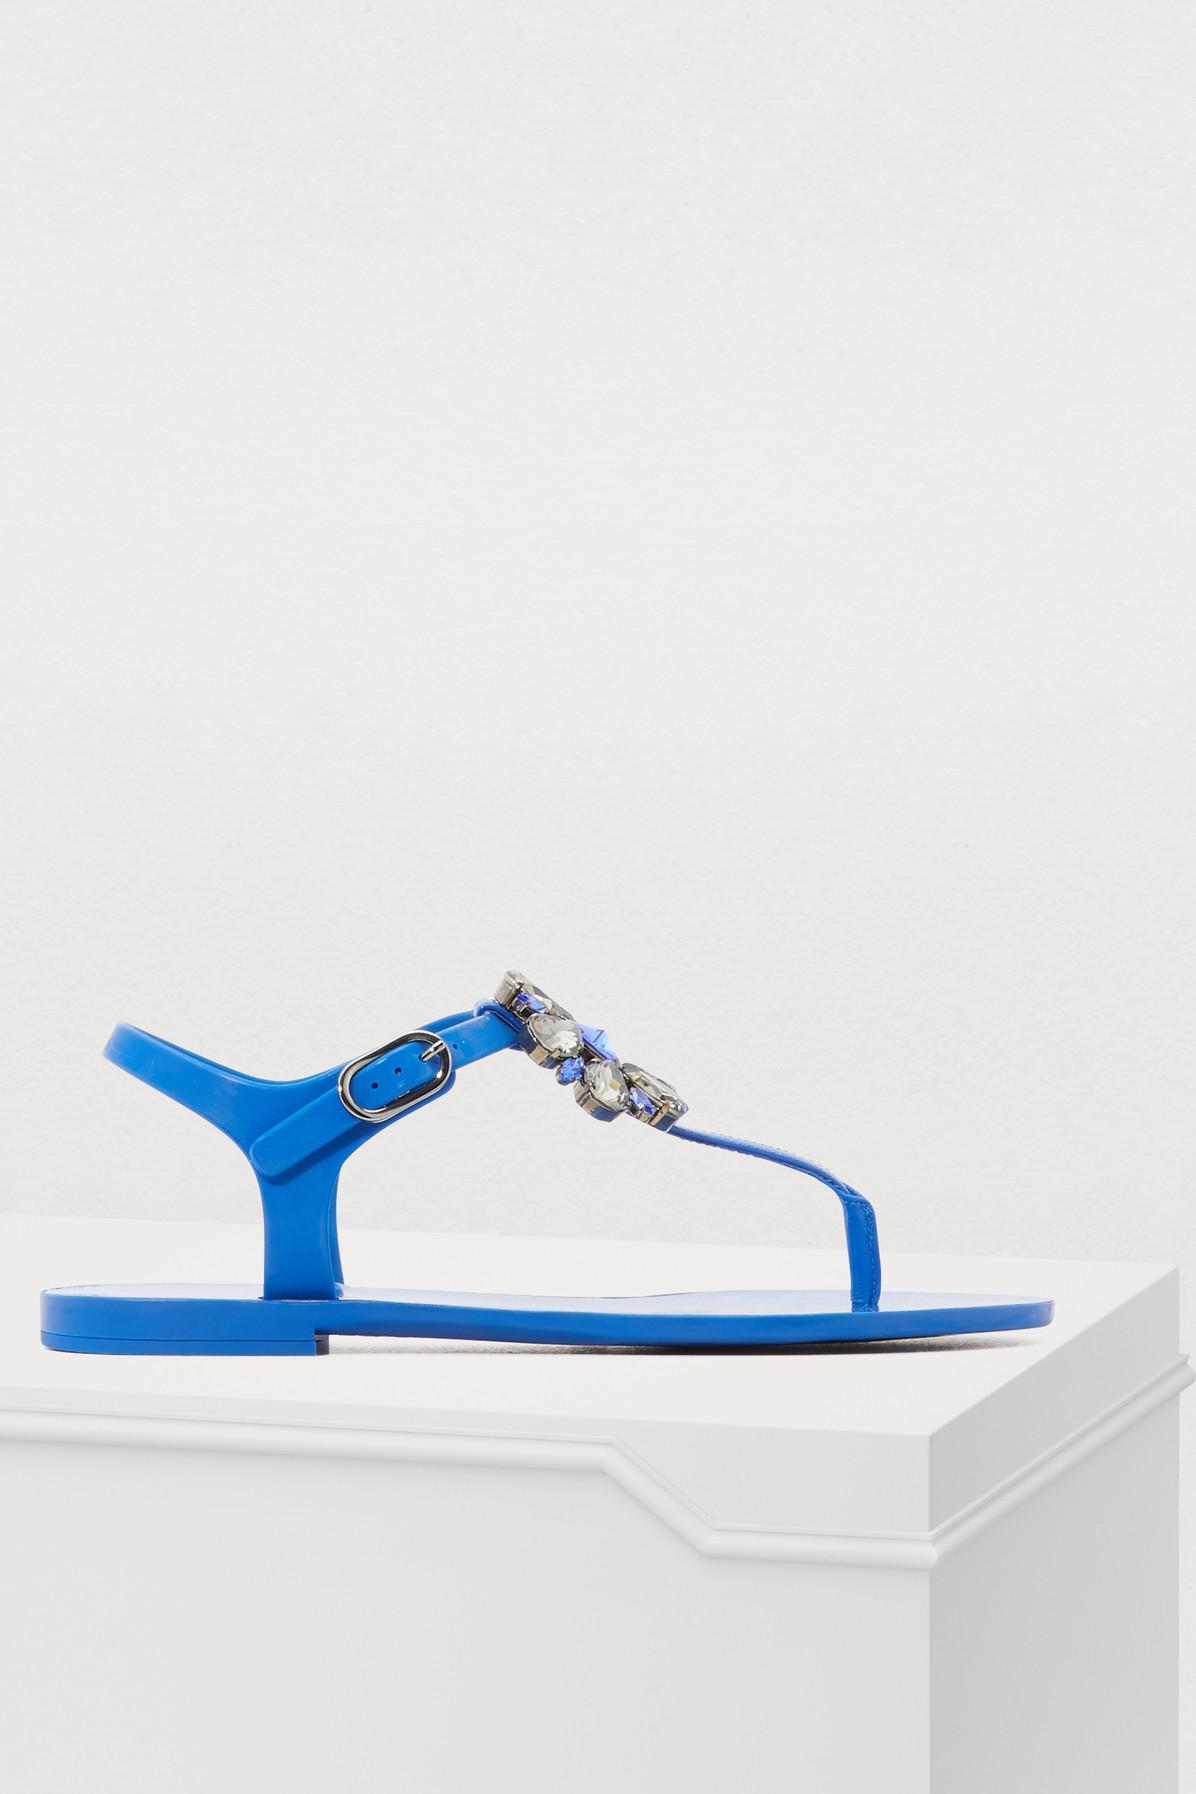 ab08bb9fa412 Dolce   Gabbana Jelly Sandals in Blue - Lyst